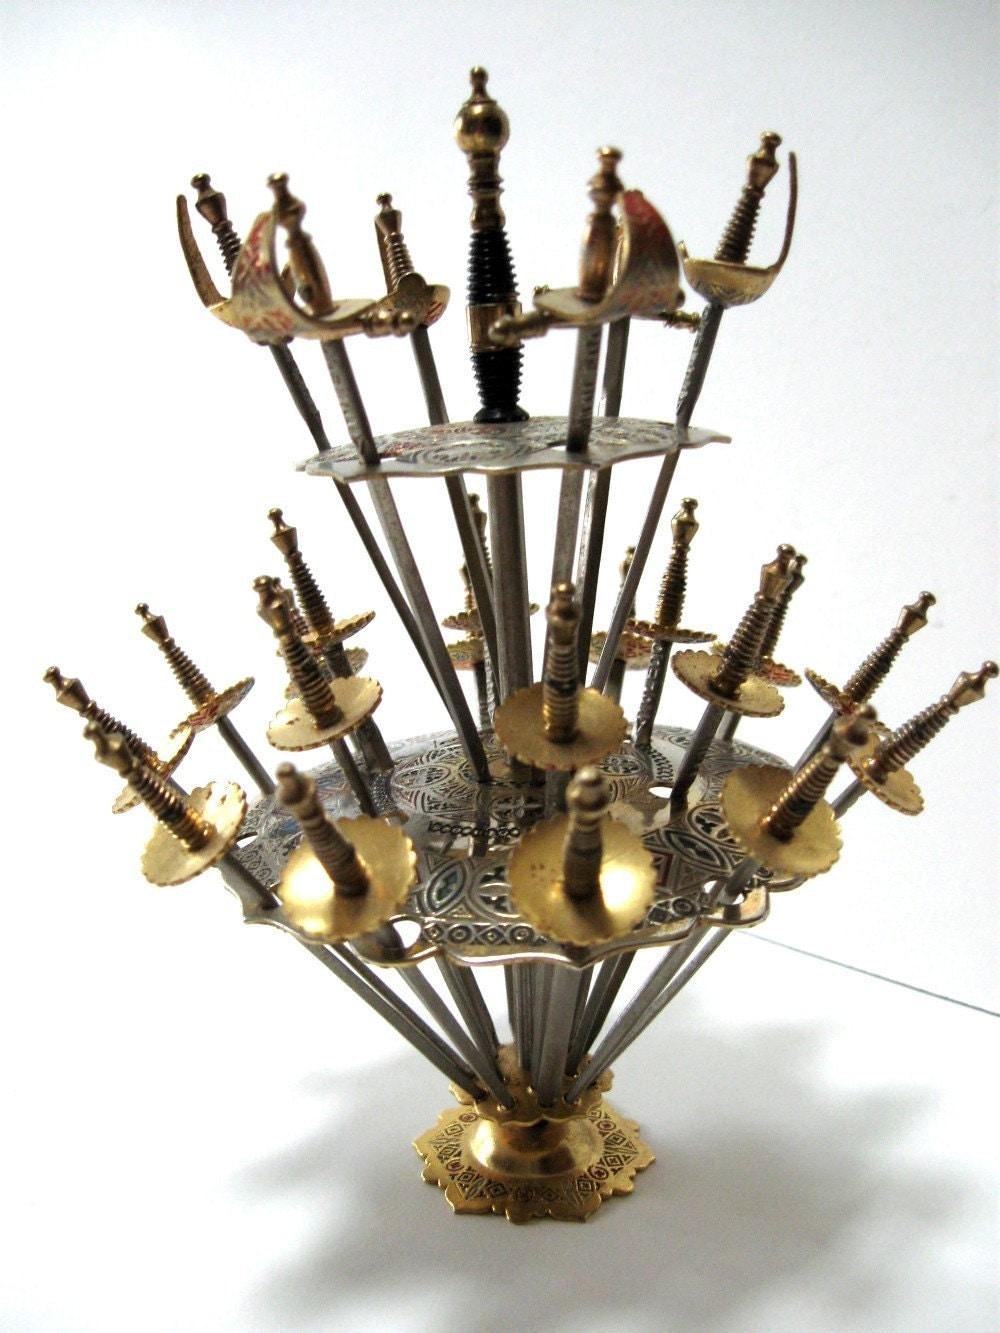 Vintage Toledo Sword Cocktail Picks and Holder Classic 1960s